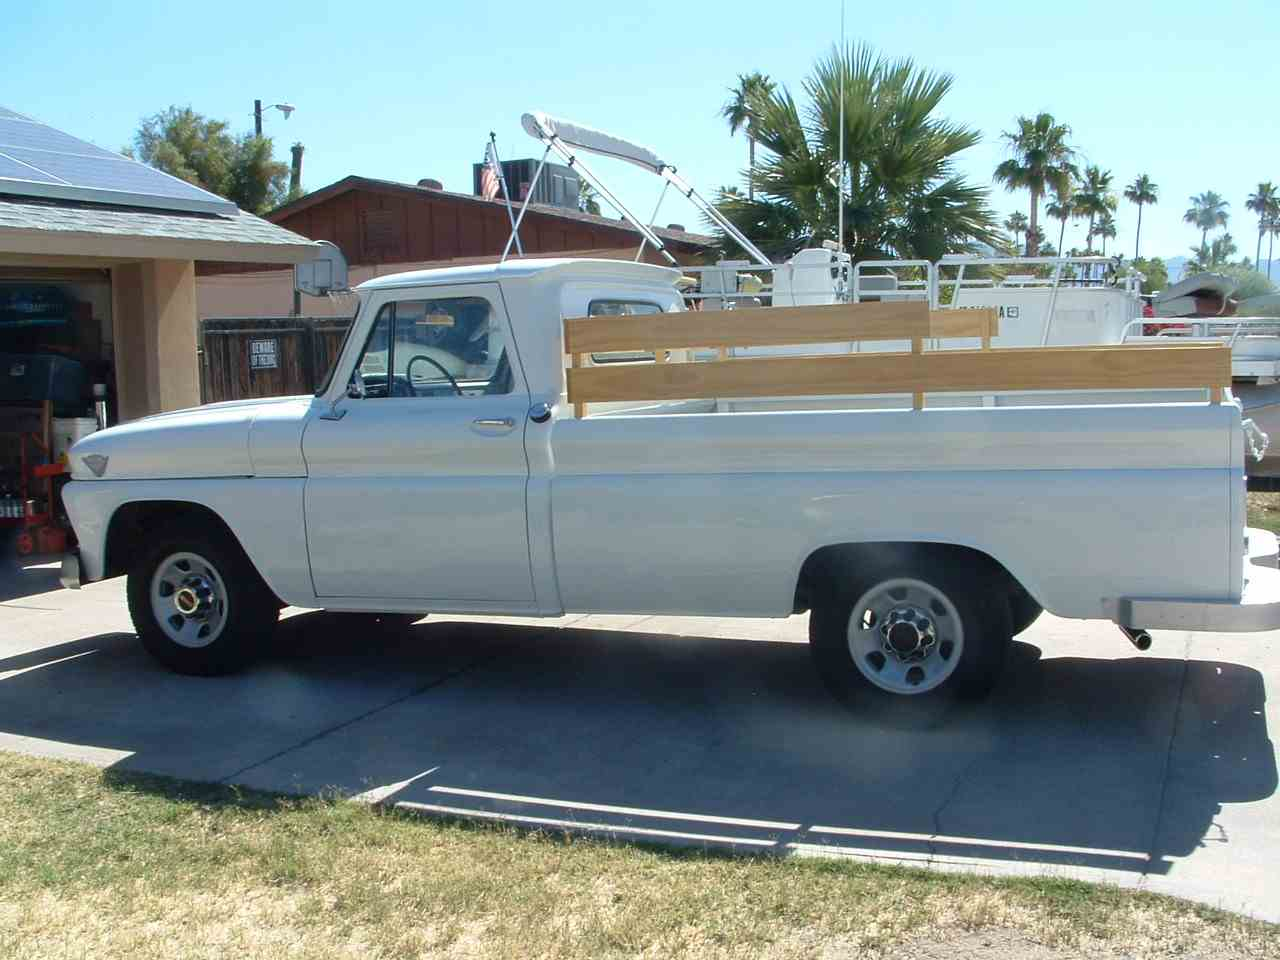 1966 GMC Pickup for Sale | ClassicCars.com | CC-990328